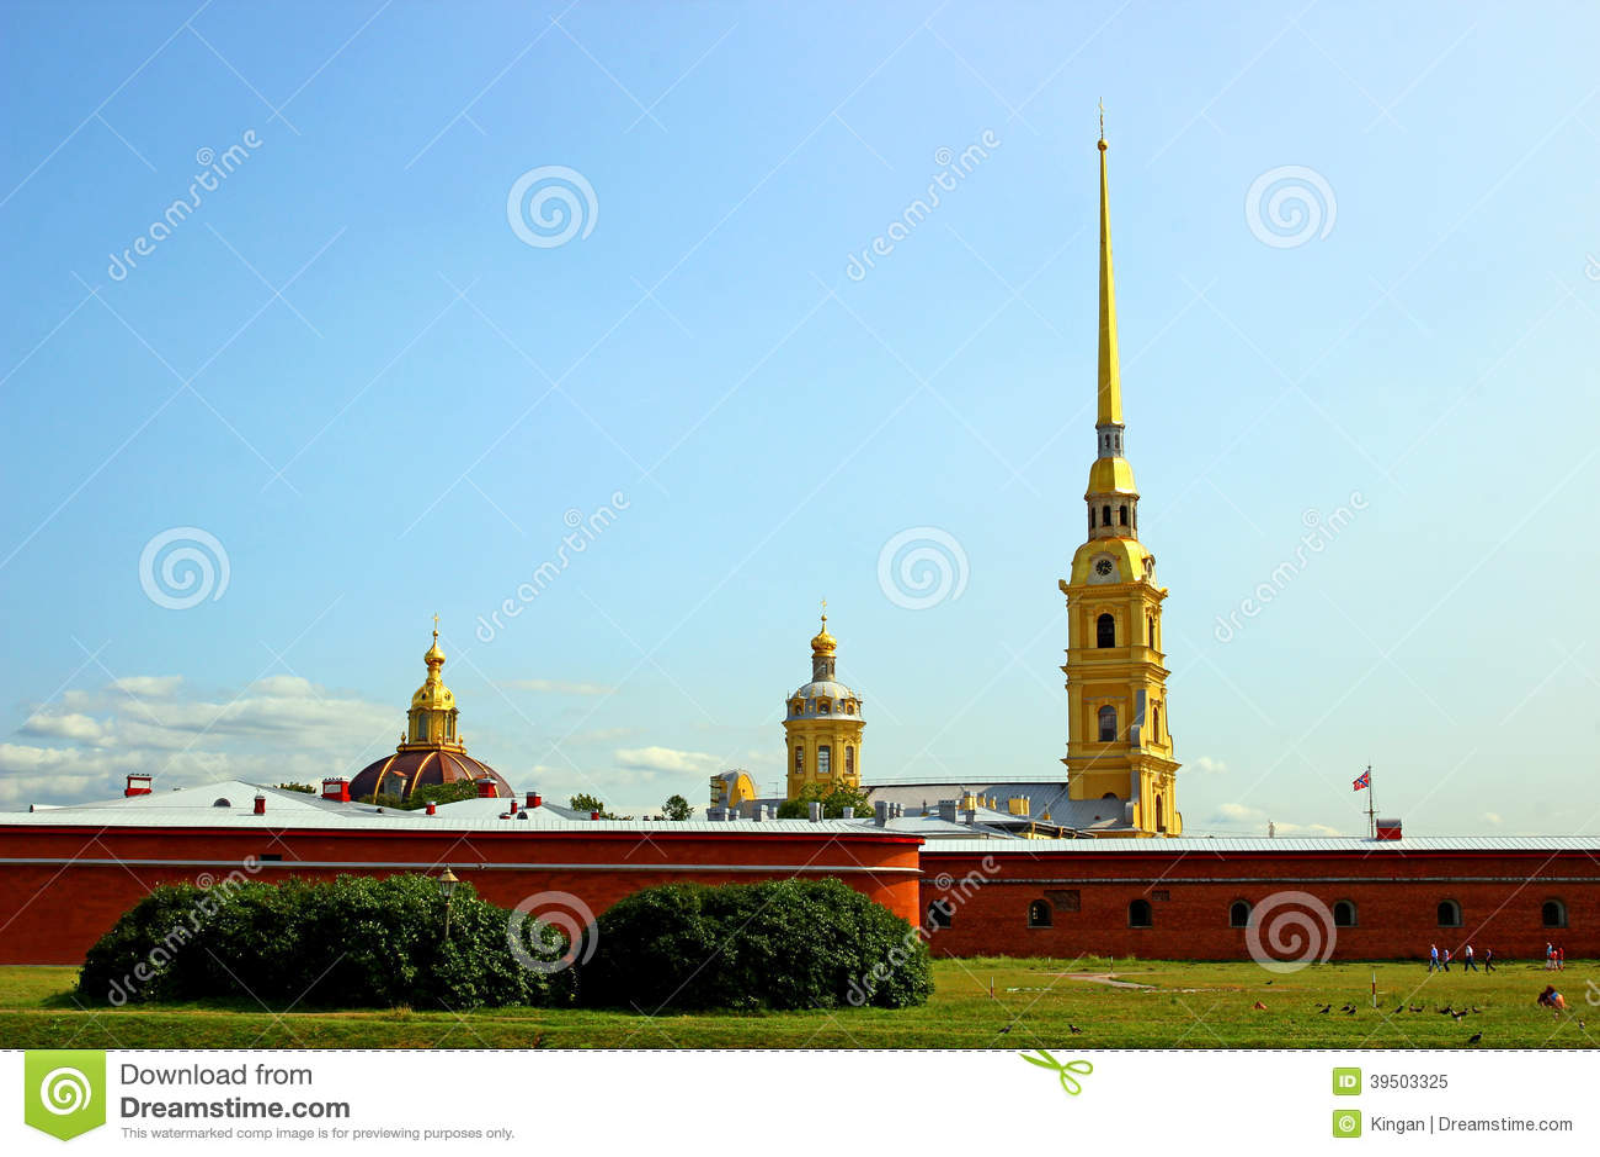 Spits van Peter en Paul Fortress in St. Petersburg